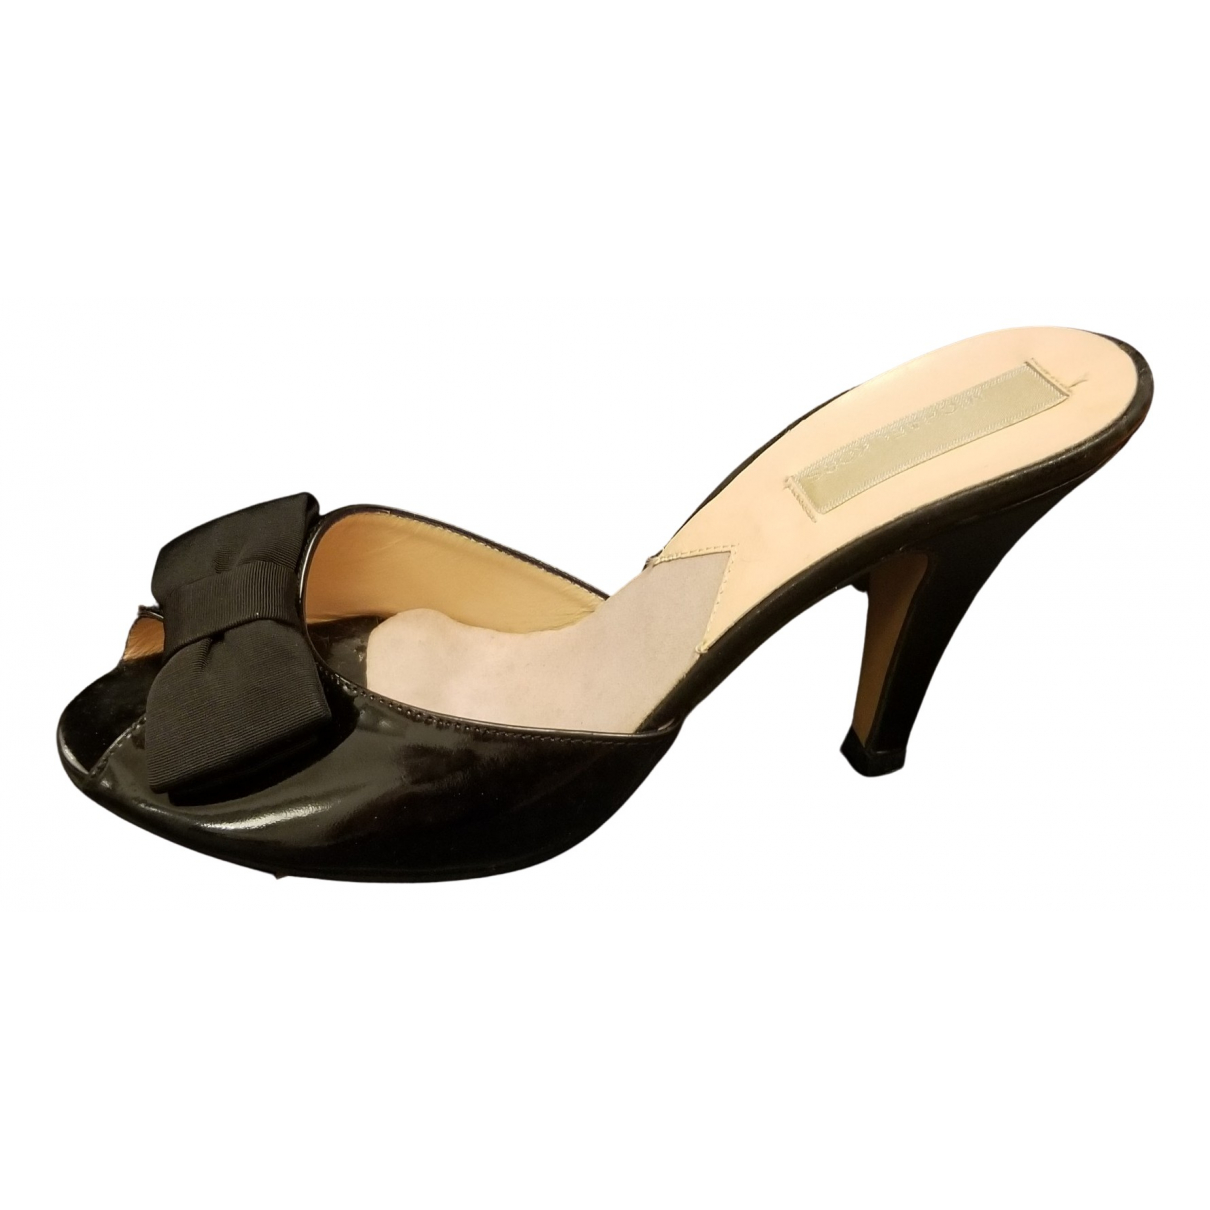 Michael Kors \N Black Patent leather Heels for Women 37.5 EU